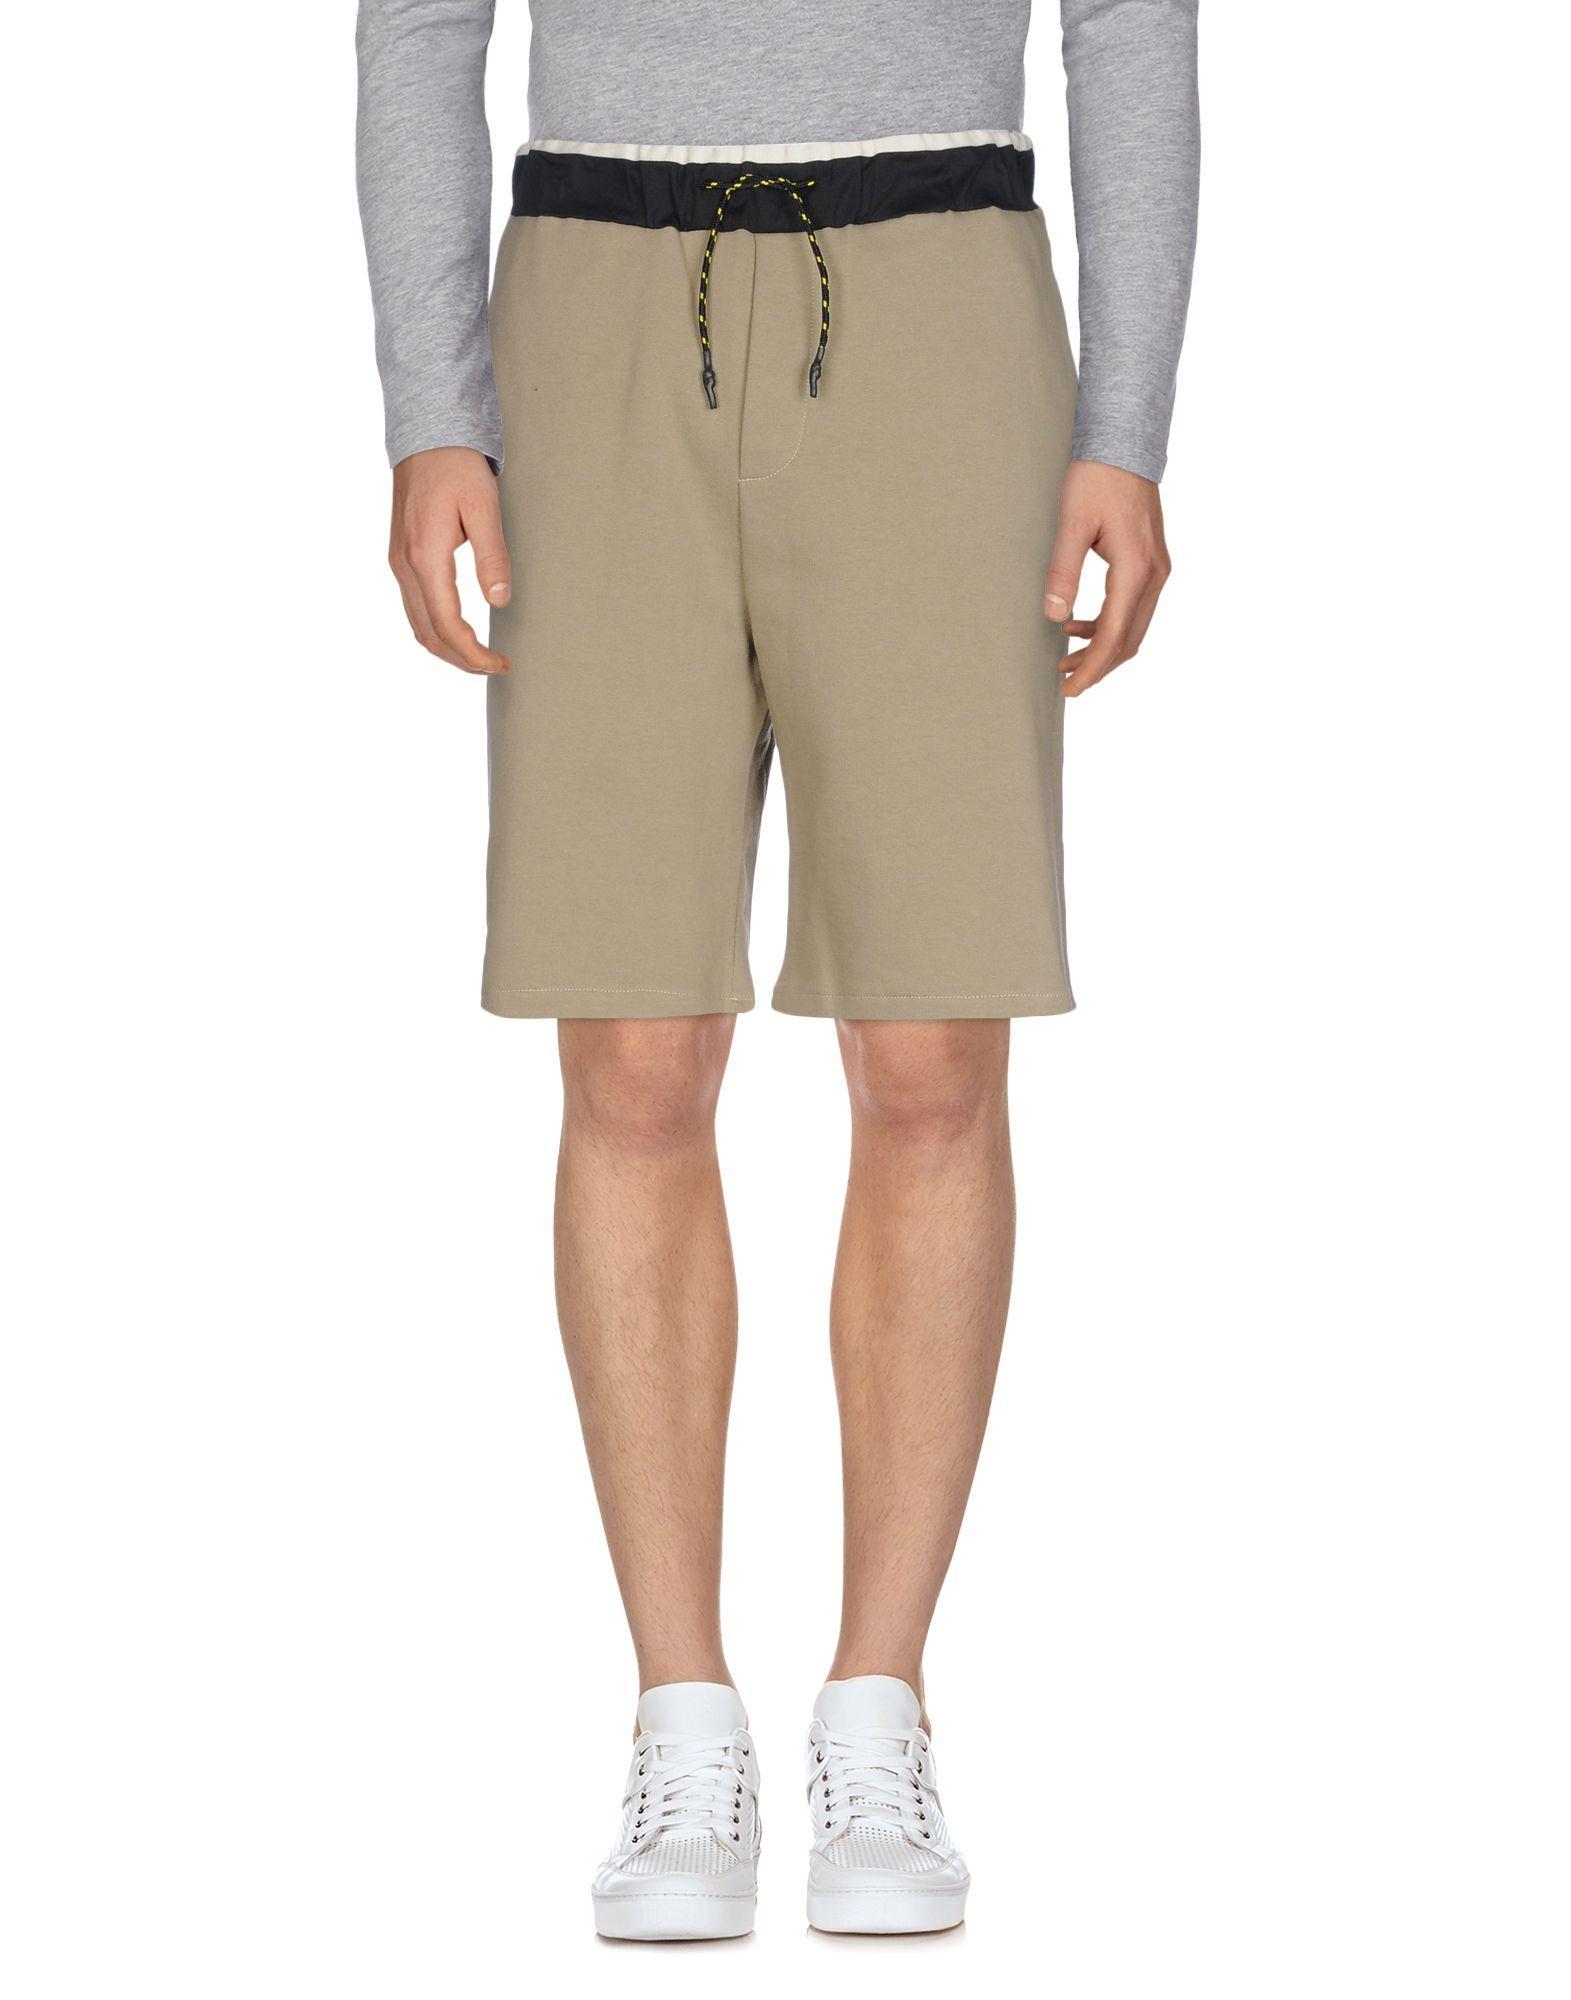 Low Brand Shorts & Bermuda In Khaki